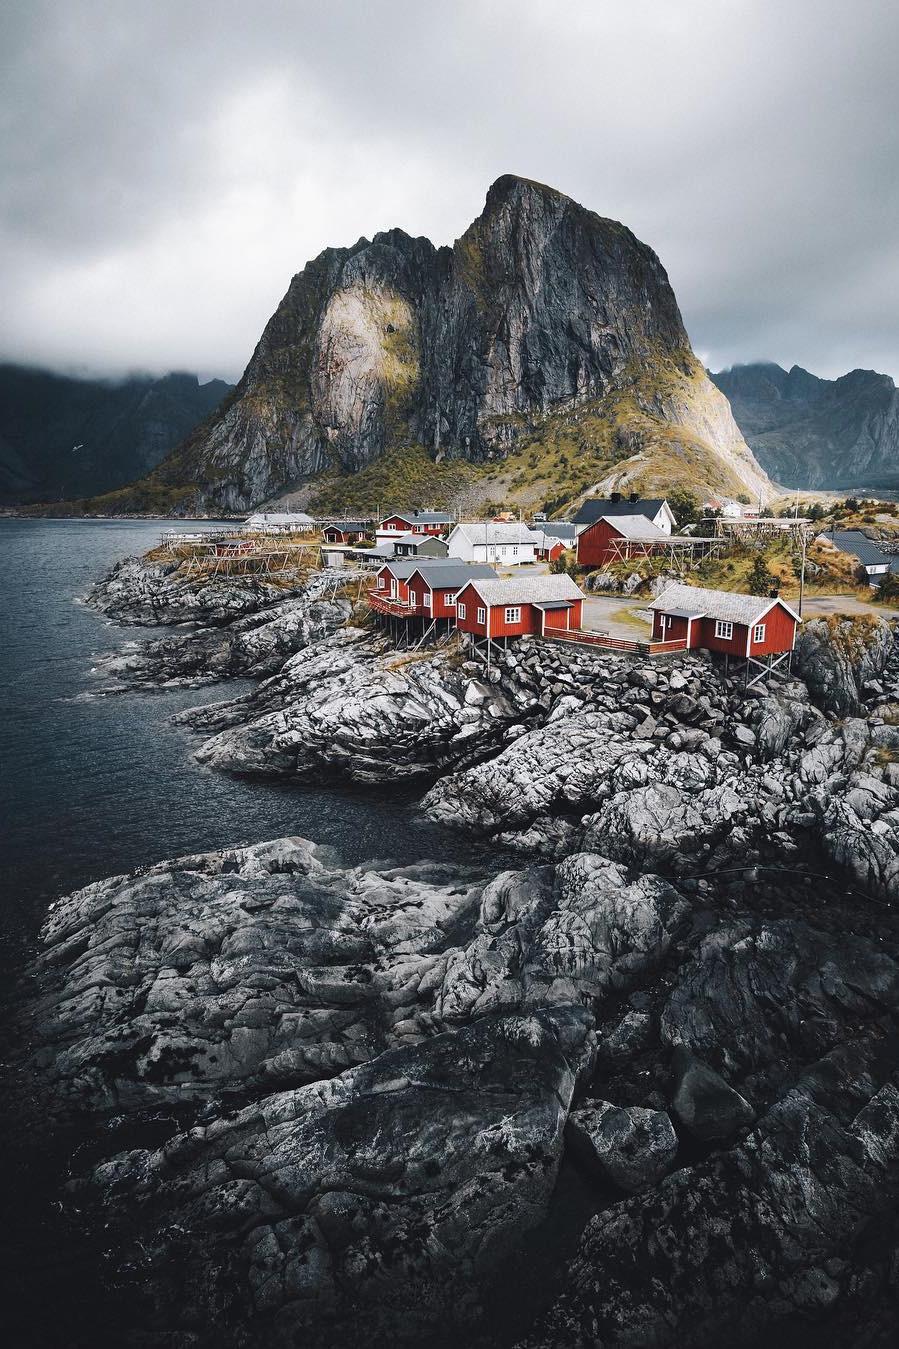 rugged mountain village